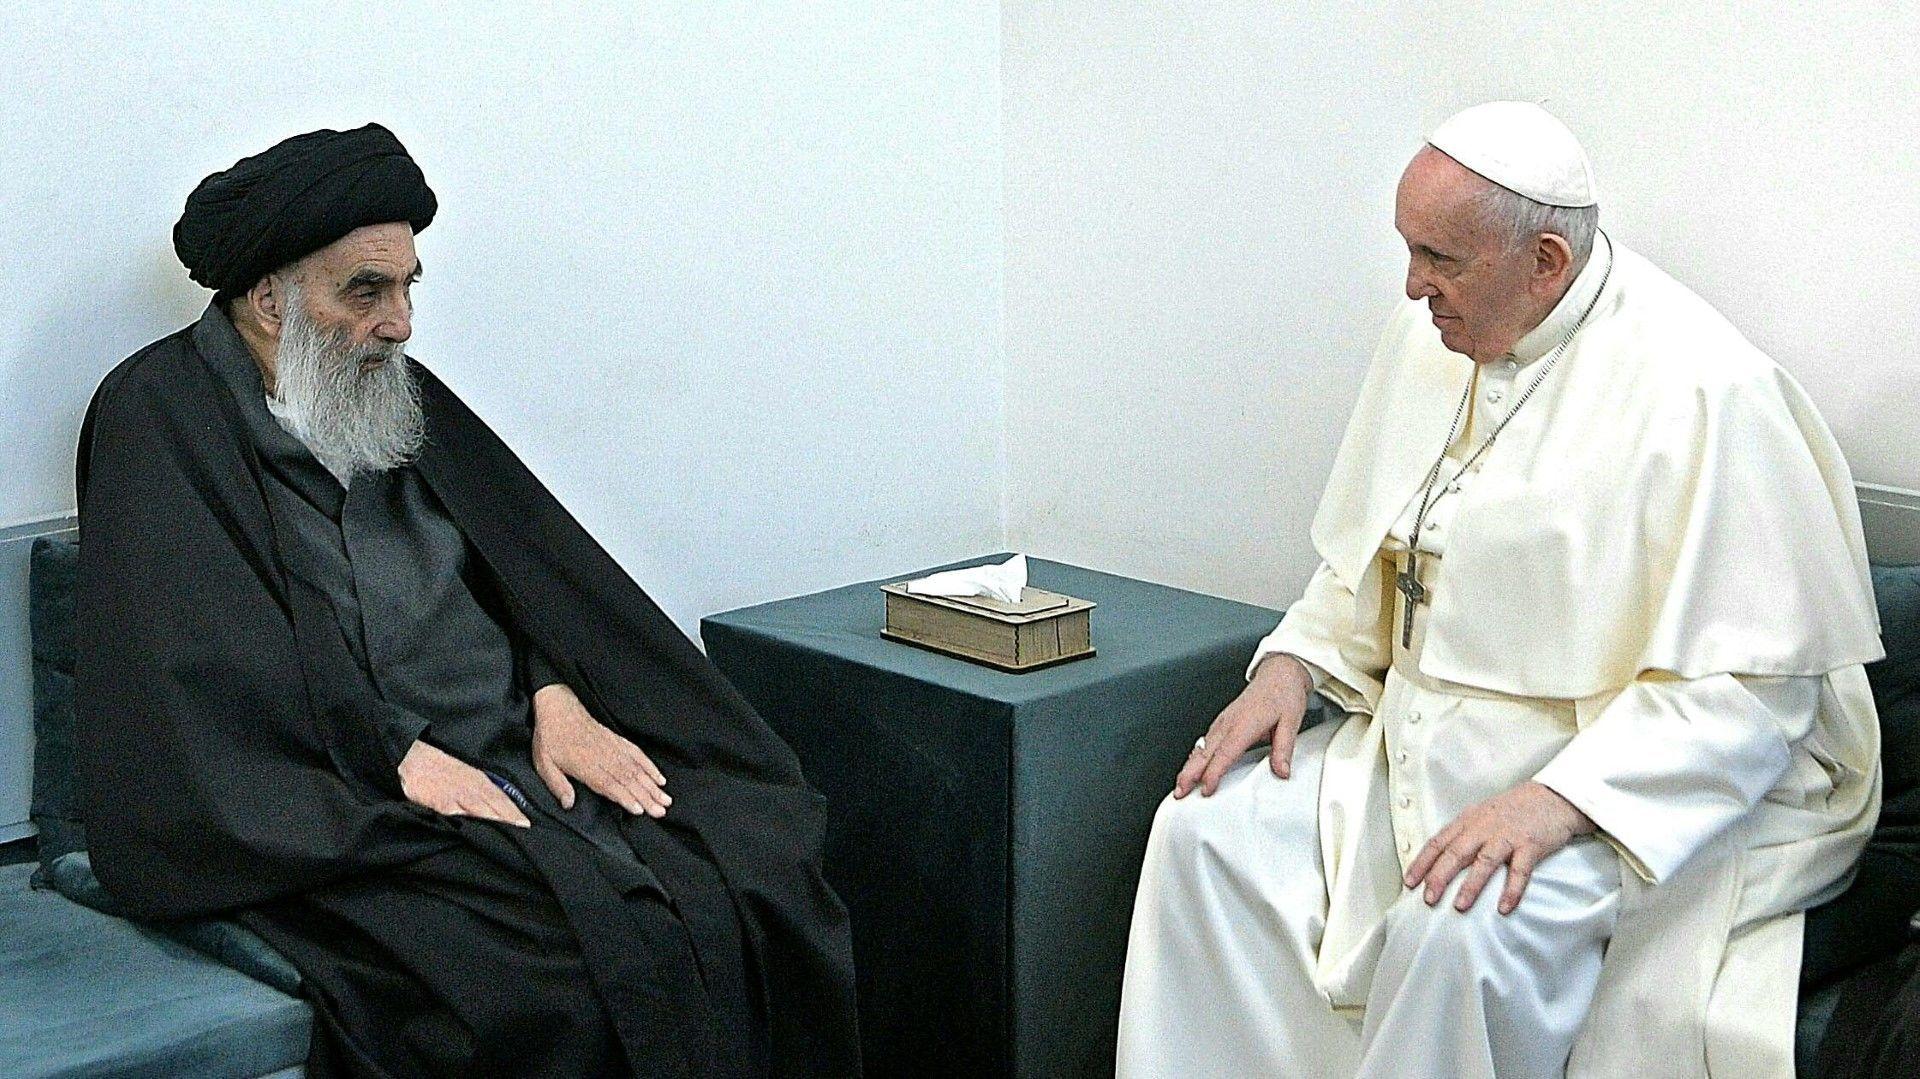 Irak: Papst Franziskus bei Schiitenführer Sistani